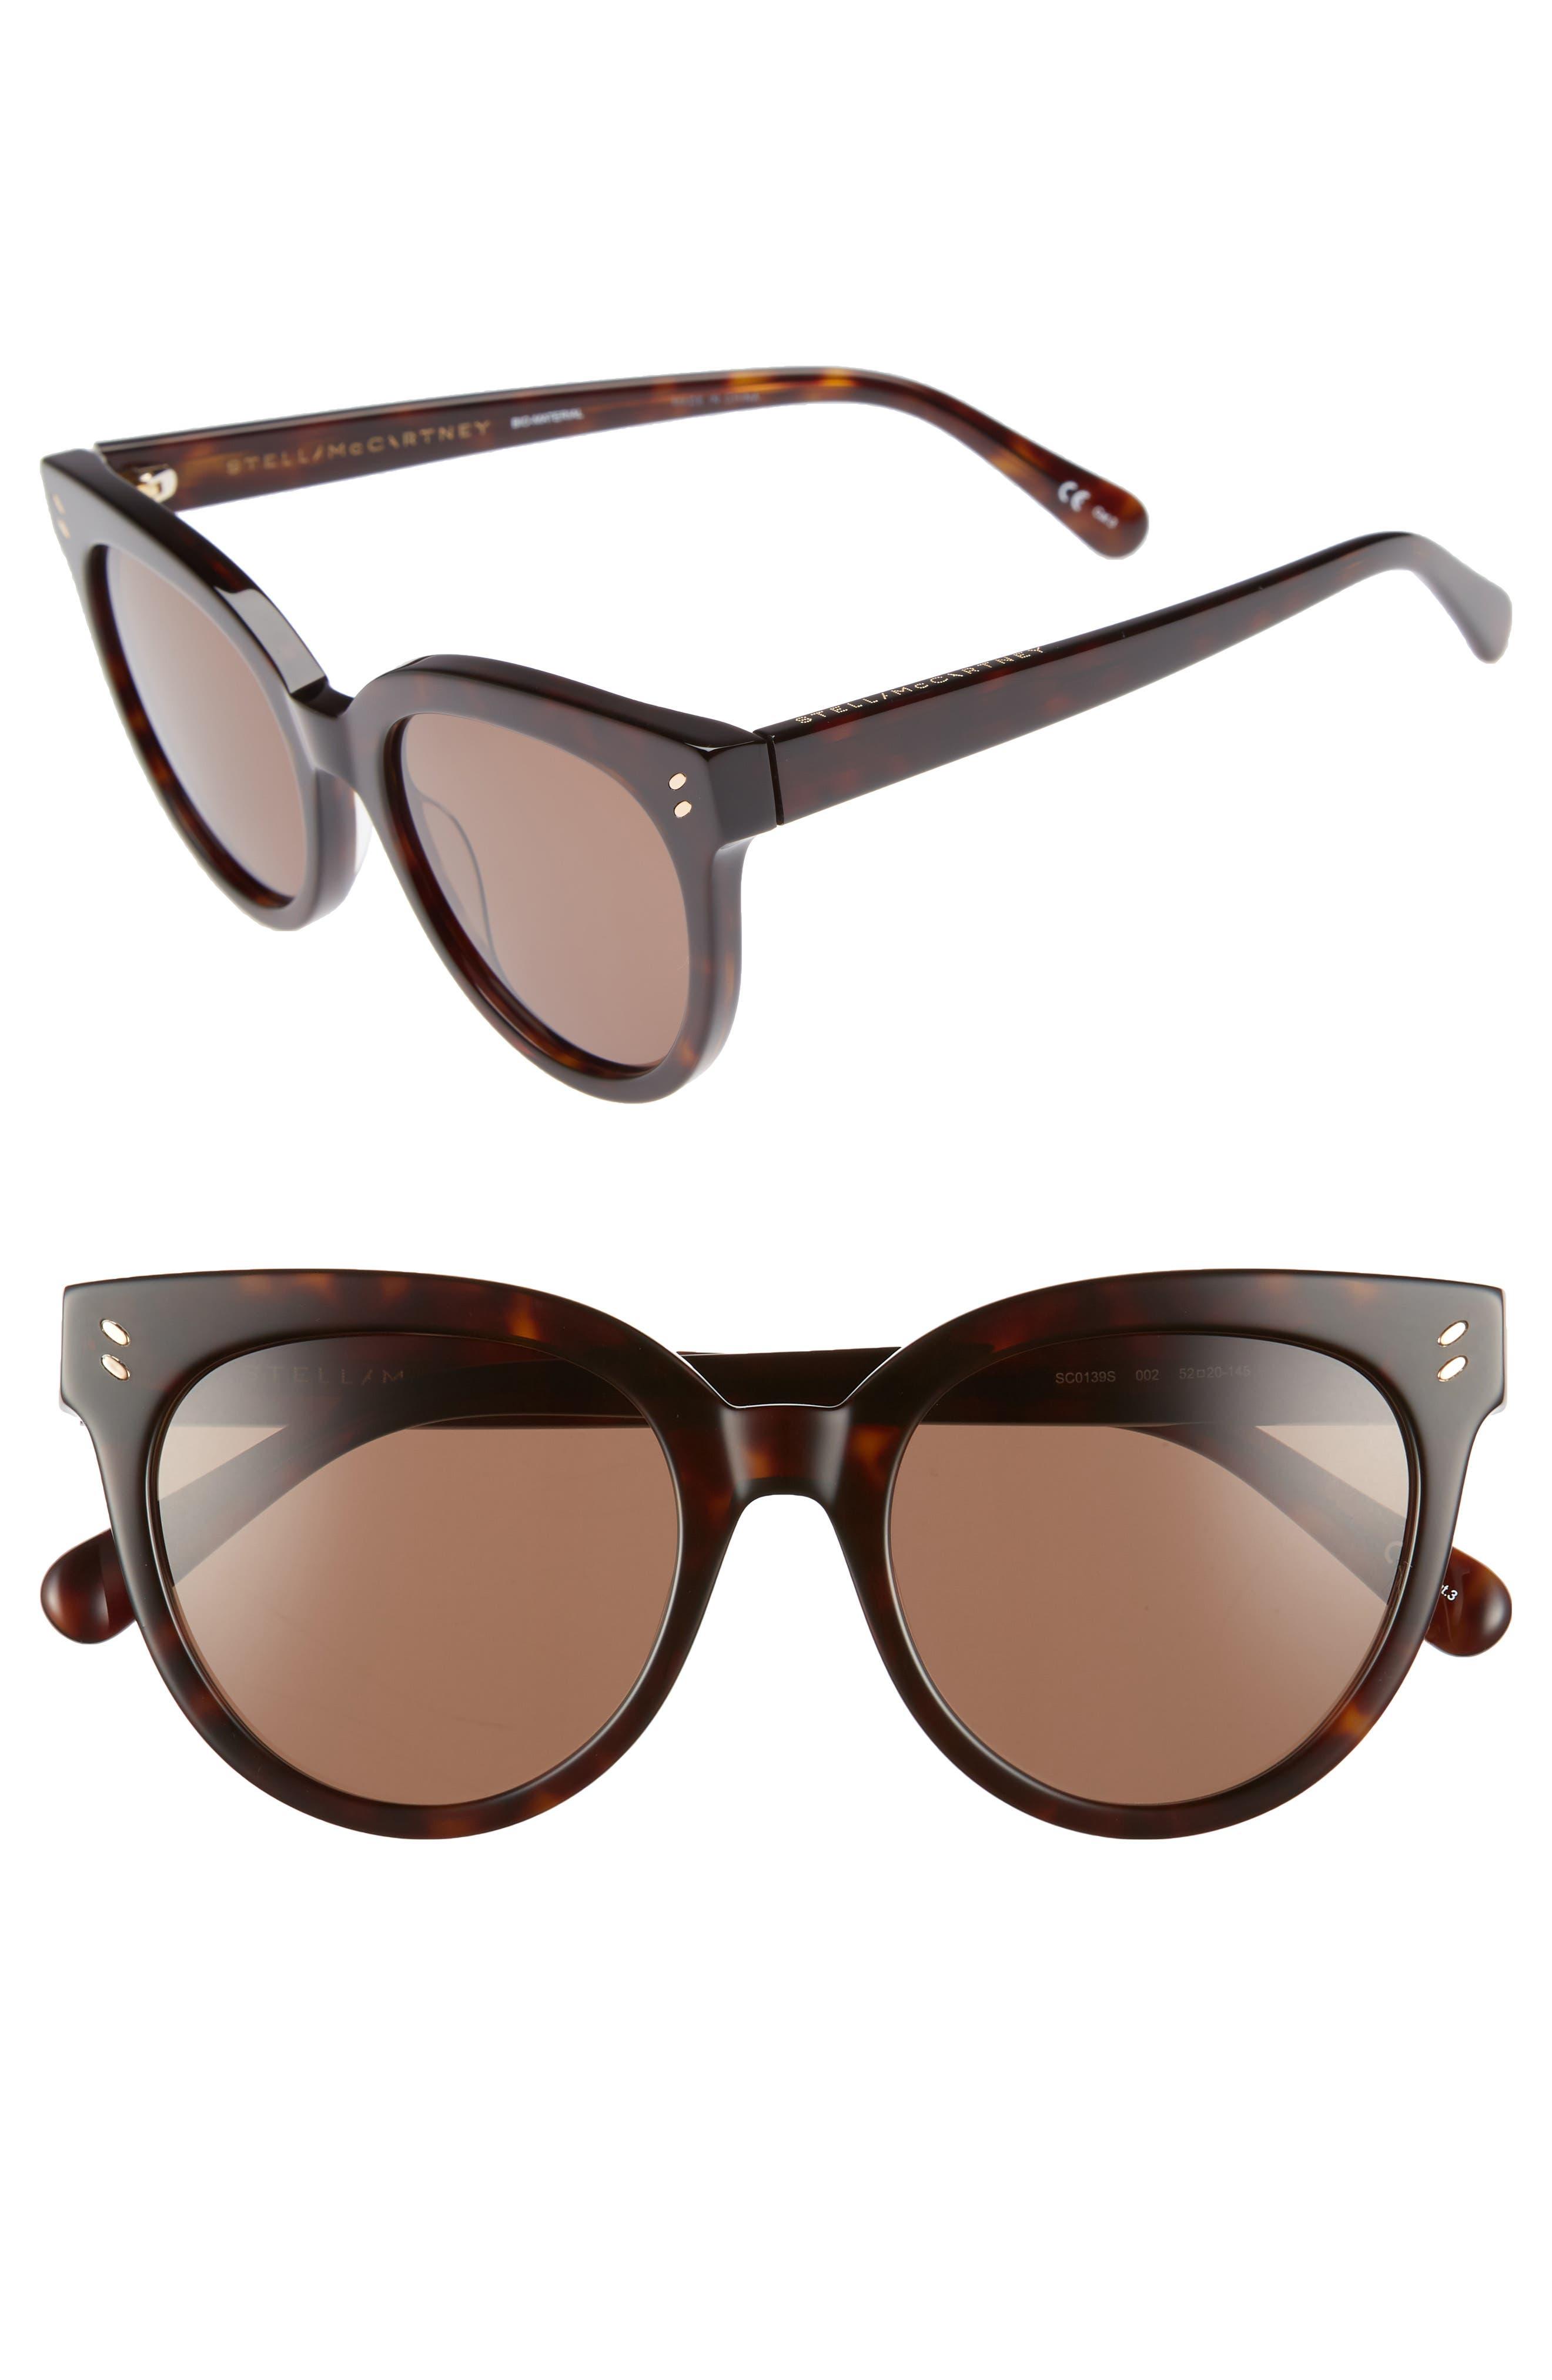 52mm Sunglasses,                         Main,                         color, Shiny Dark Havana